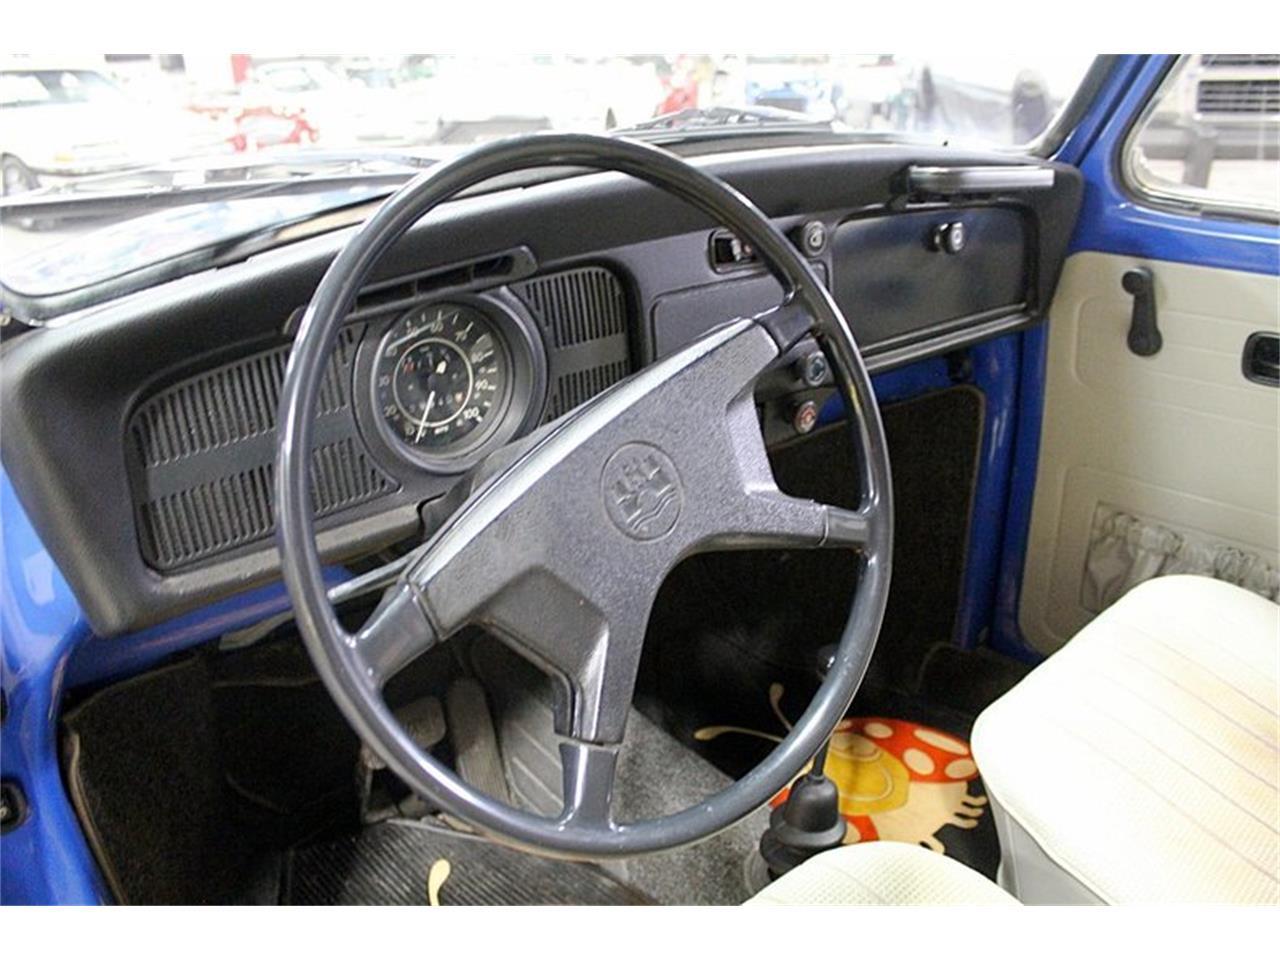 Large Picture of 1972 Volkswagen Super Beetle - $14,900.00 - PTI6